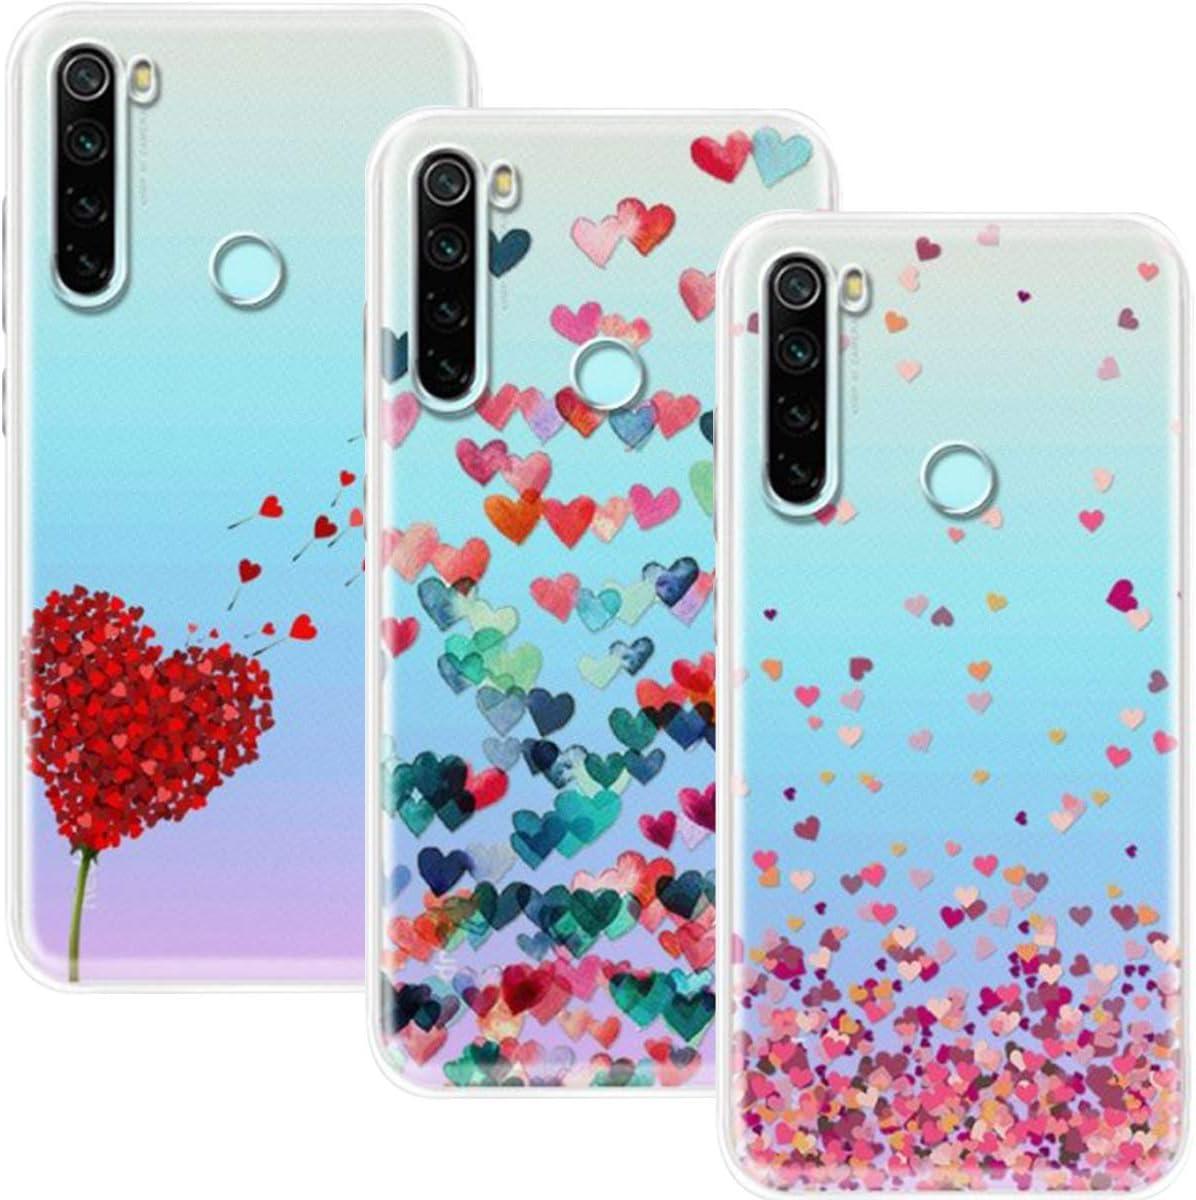 Young & Ming Funda para Xiaomi Redmi Note 8 2021 & 2019, (3 Pack) Transparente TPU Silicona Carcasa Delgado Antigolpes Resistente, Amor